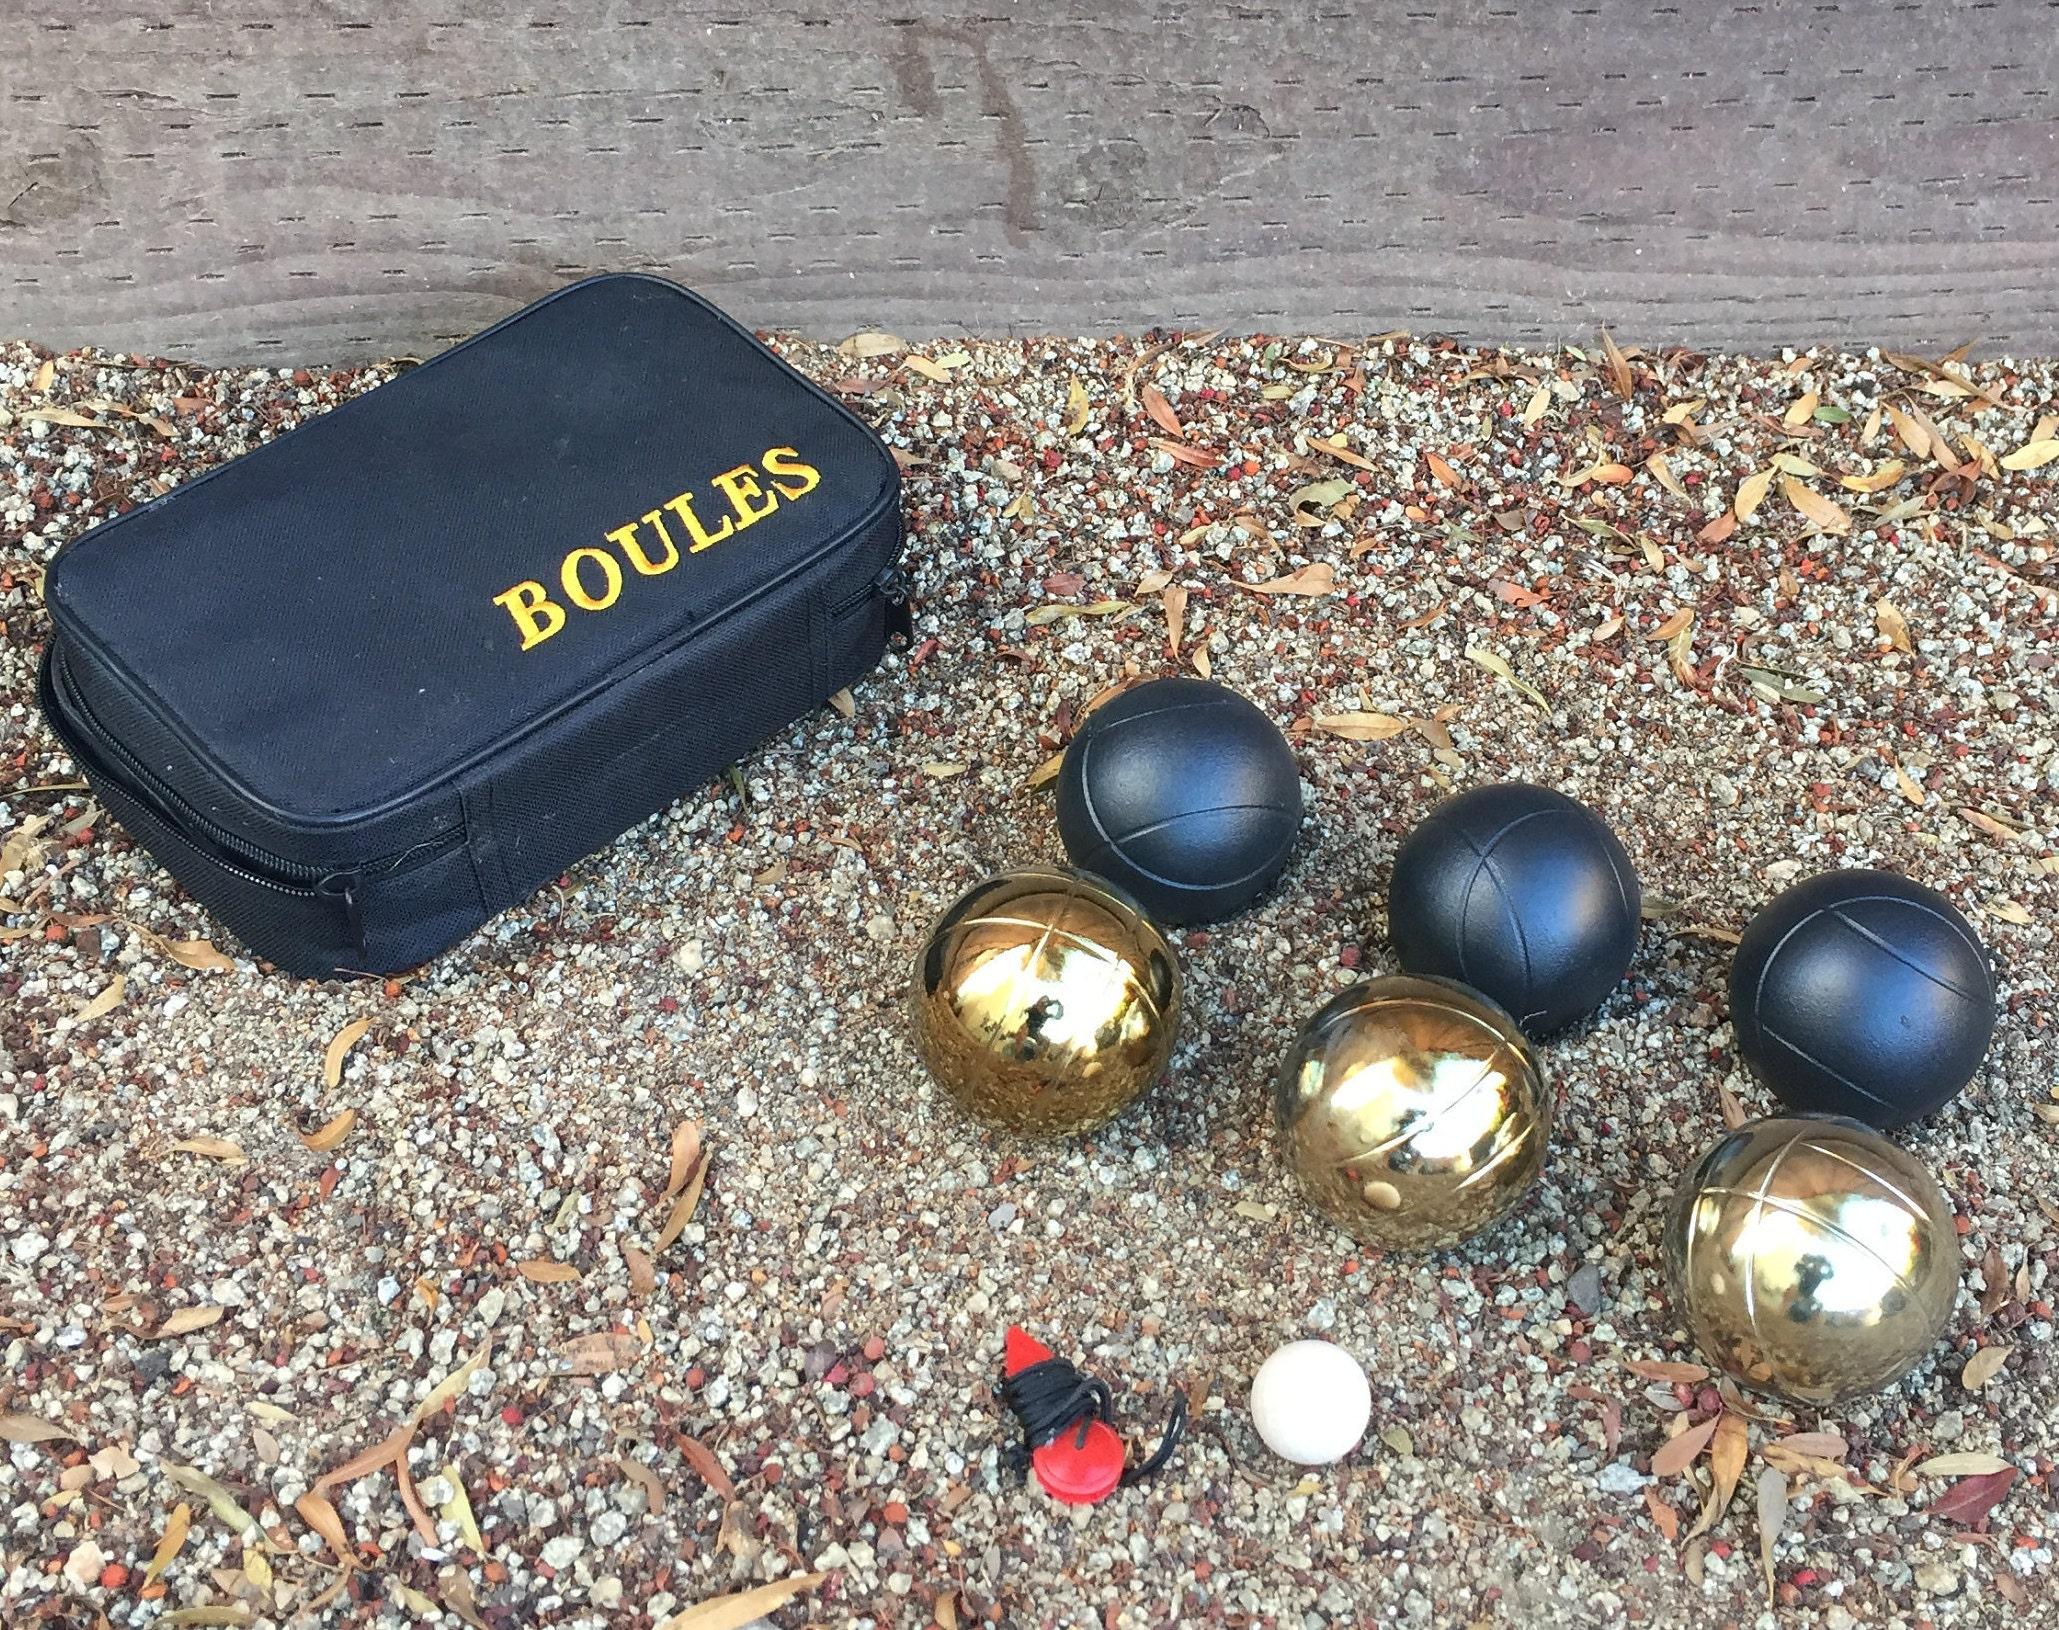 6 ball 73mm Metal Boules Petanque set 3 blue balls and 3 red balls